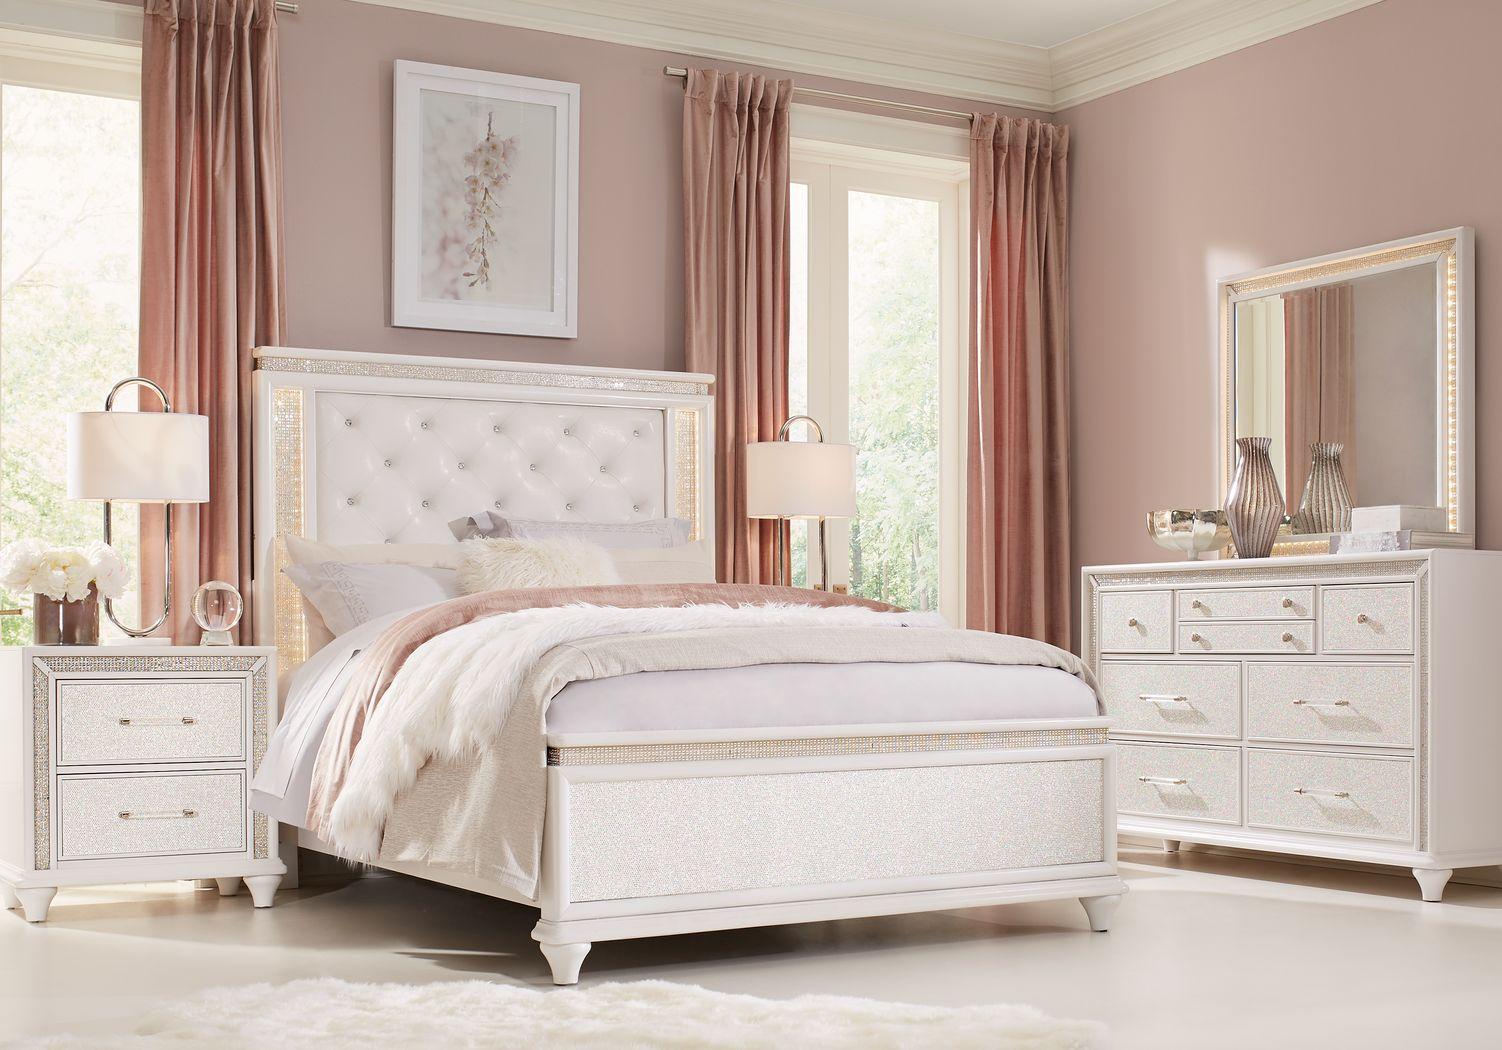 Sofia Vergara Vegas White 7 Pc Queen Panel Bedroom